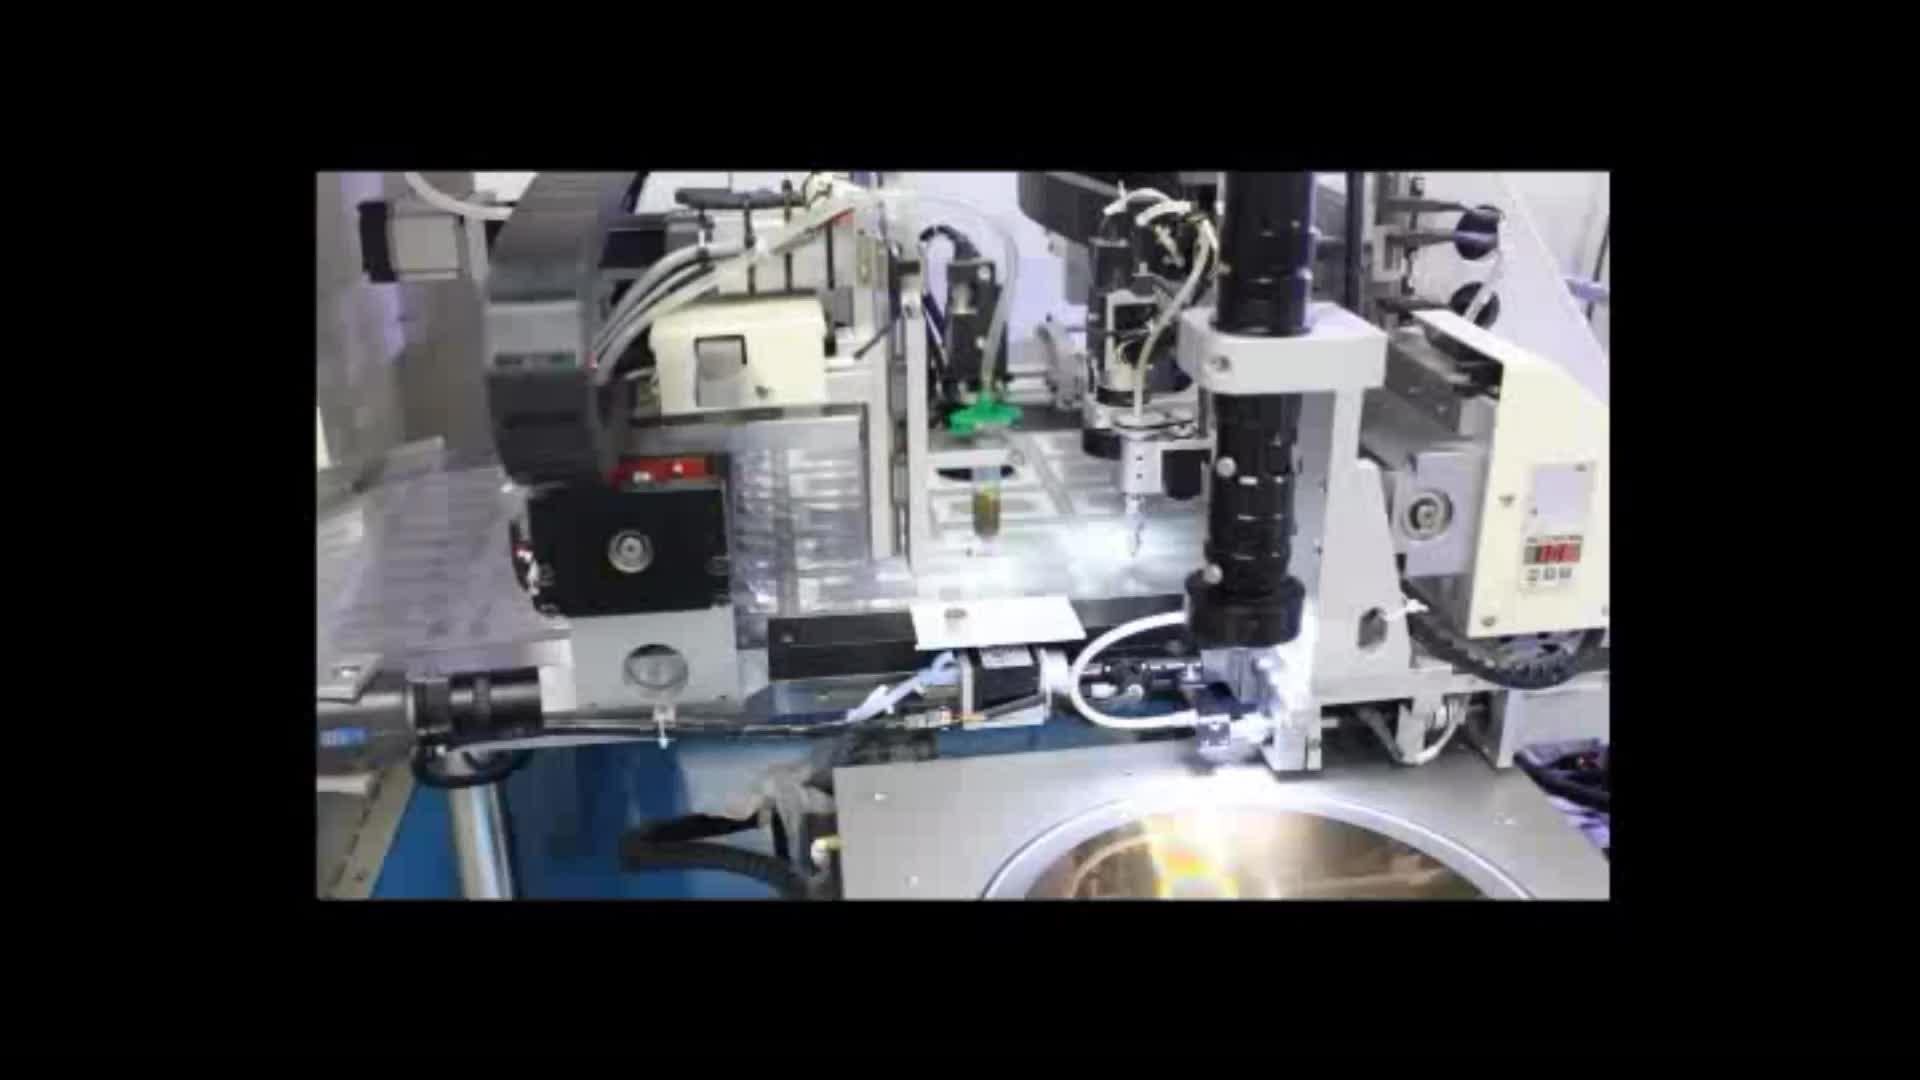 Erişim kontrol kartı temassız em4200 tk4100 t5577 rfid çip pvc akıllı boş proximity id 125 khz em rfid kartı